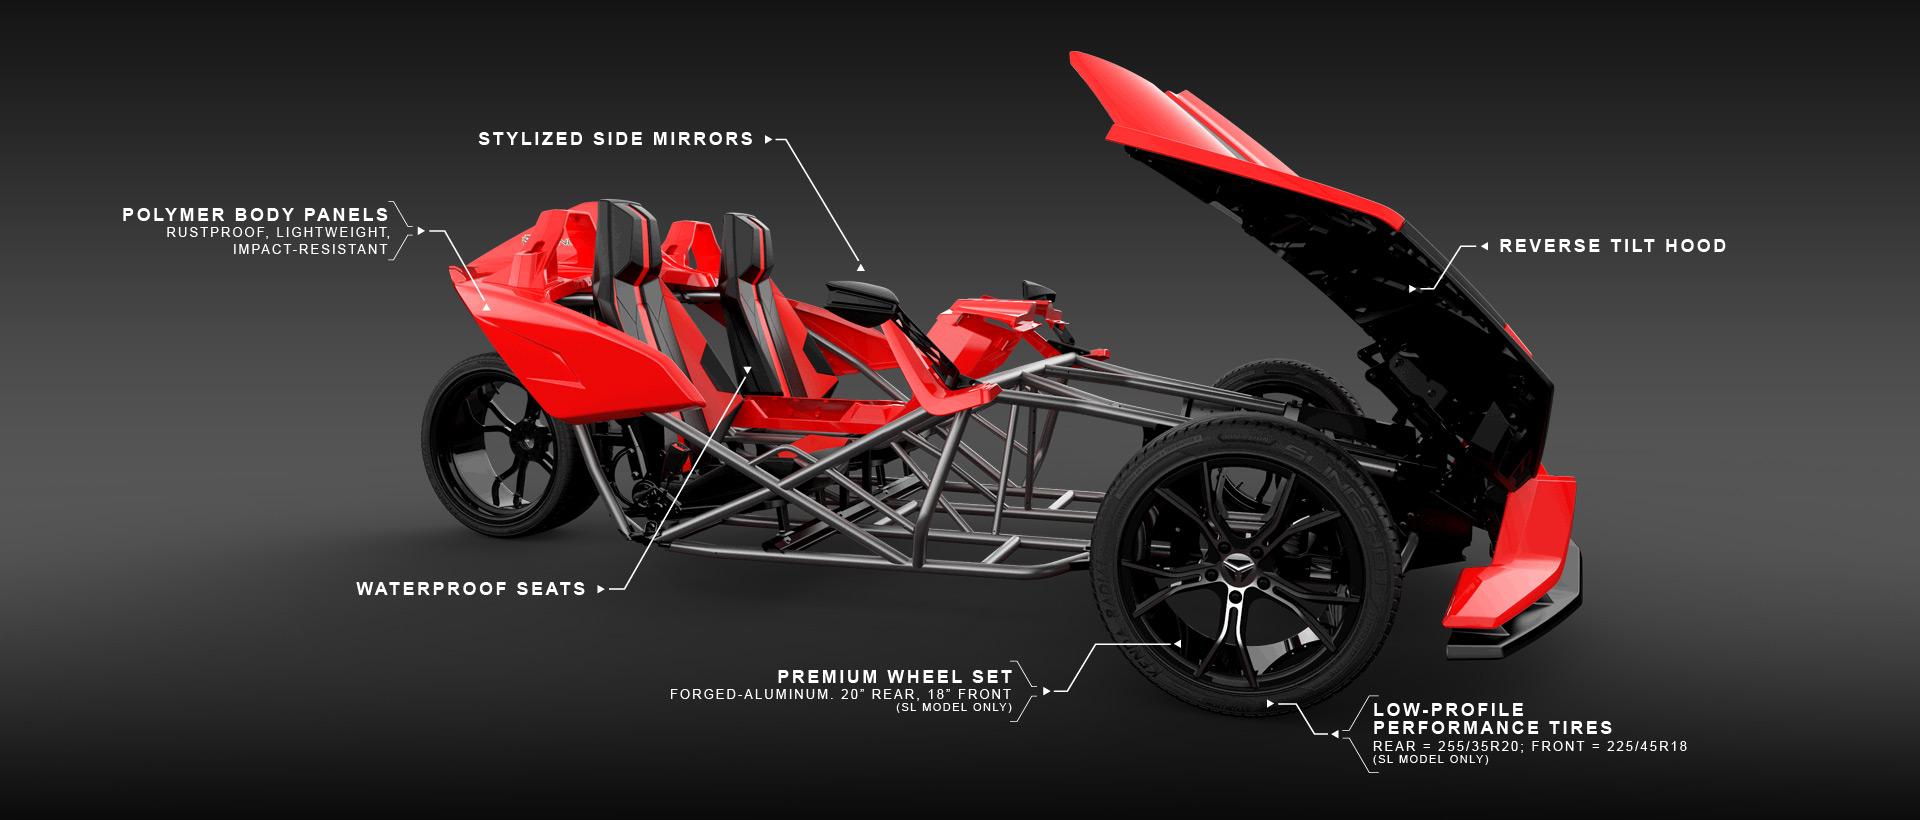 Polaris Slingshot Frame And Body Panels Car Body Design